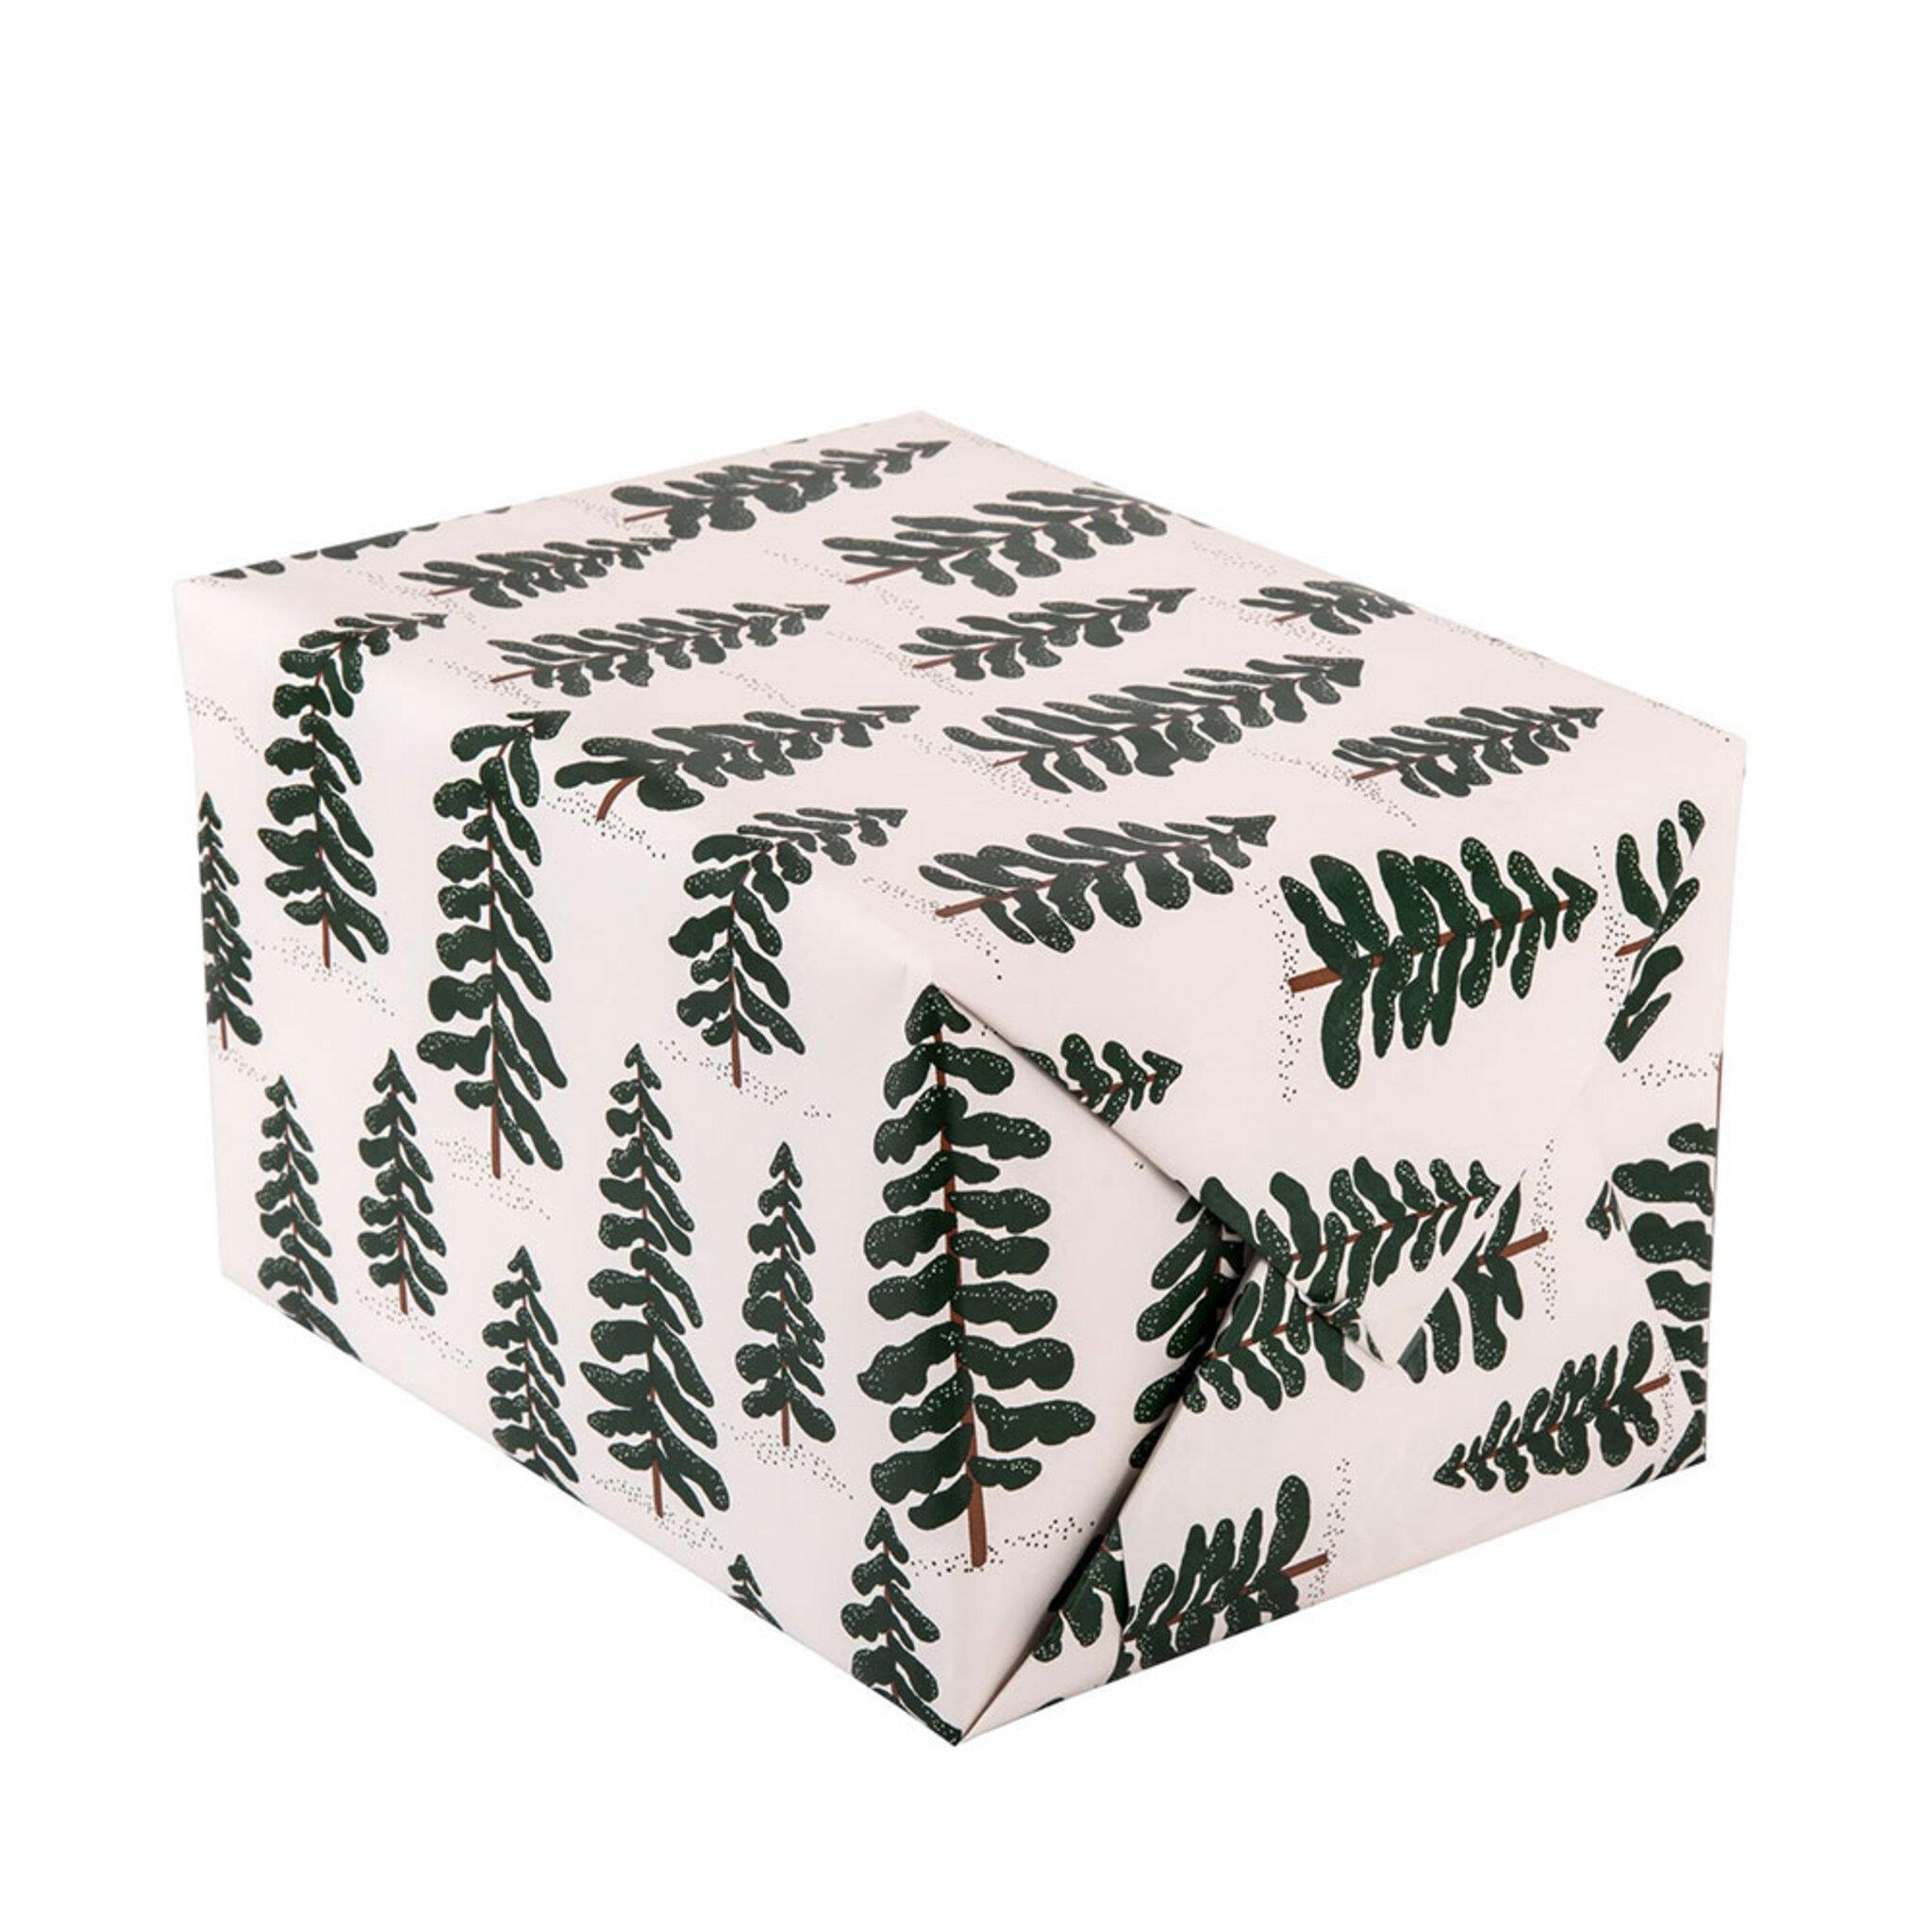 Presentpapper Snowforest 4 m